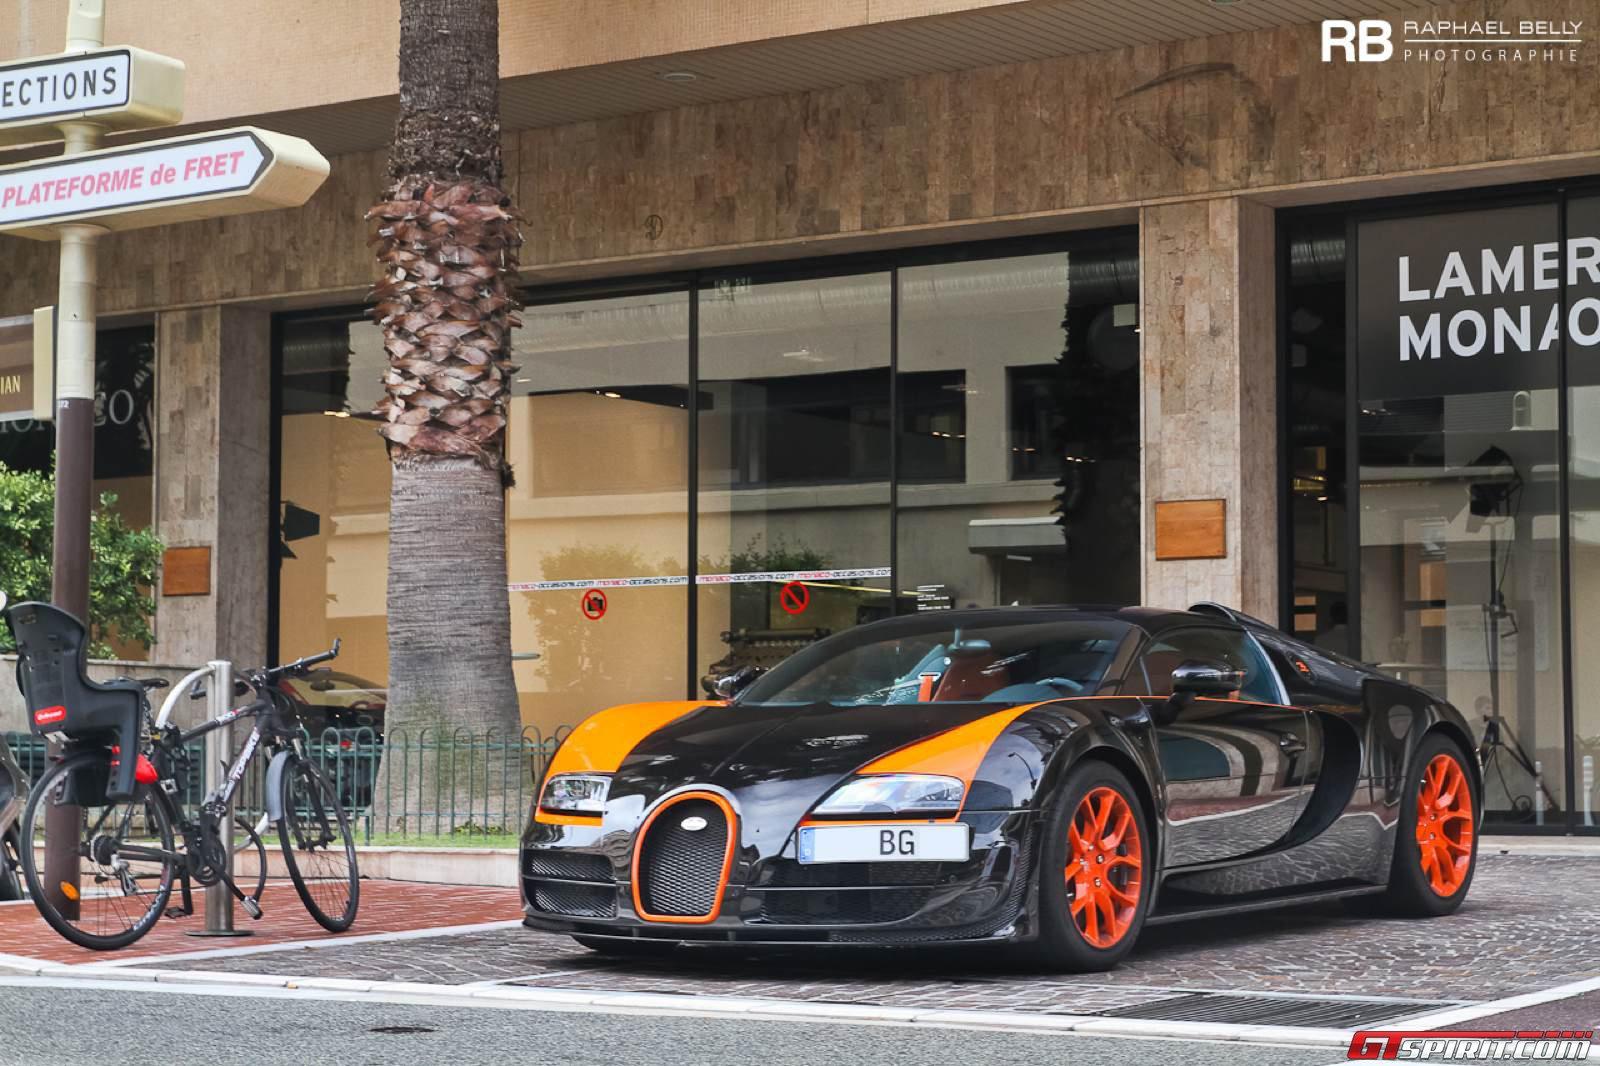 Bugatti dealership locations